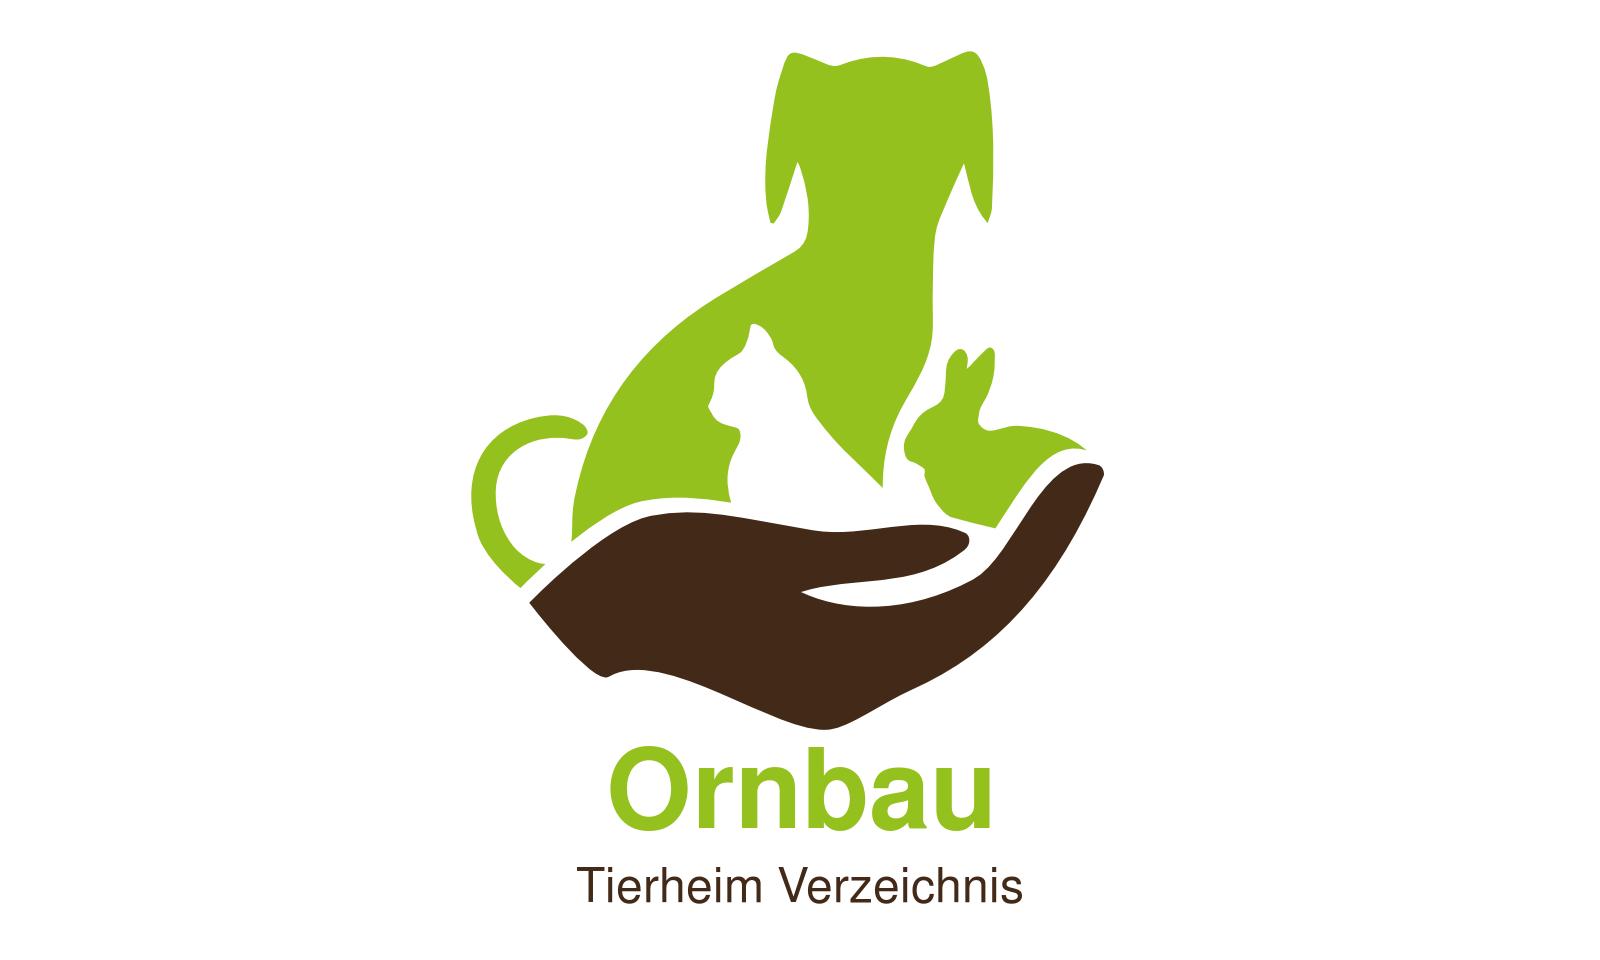 Tierheim Ornbau